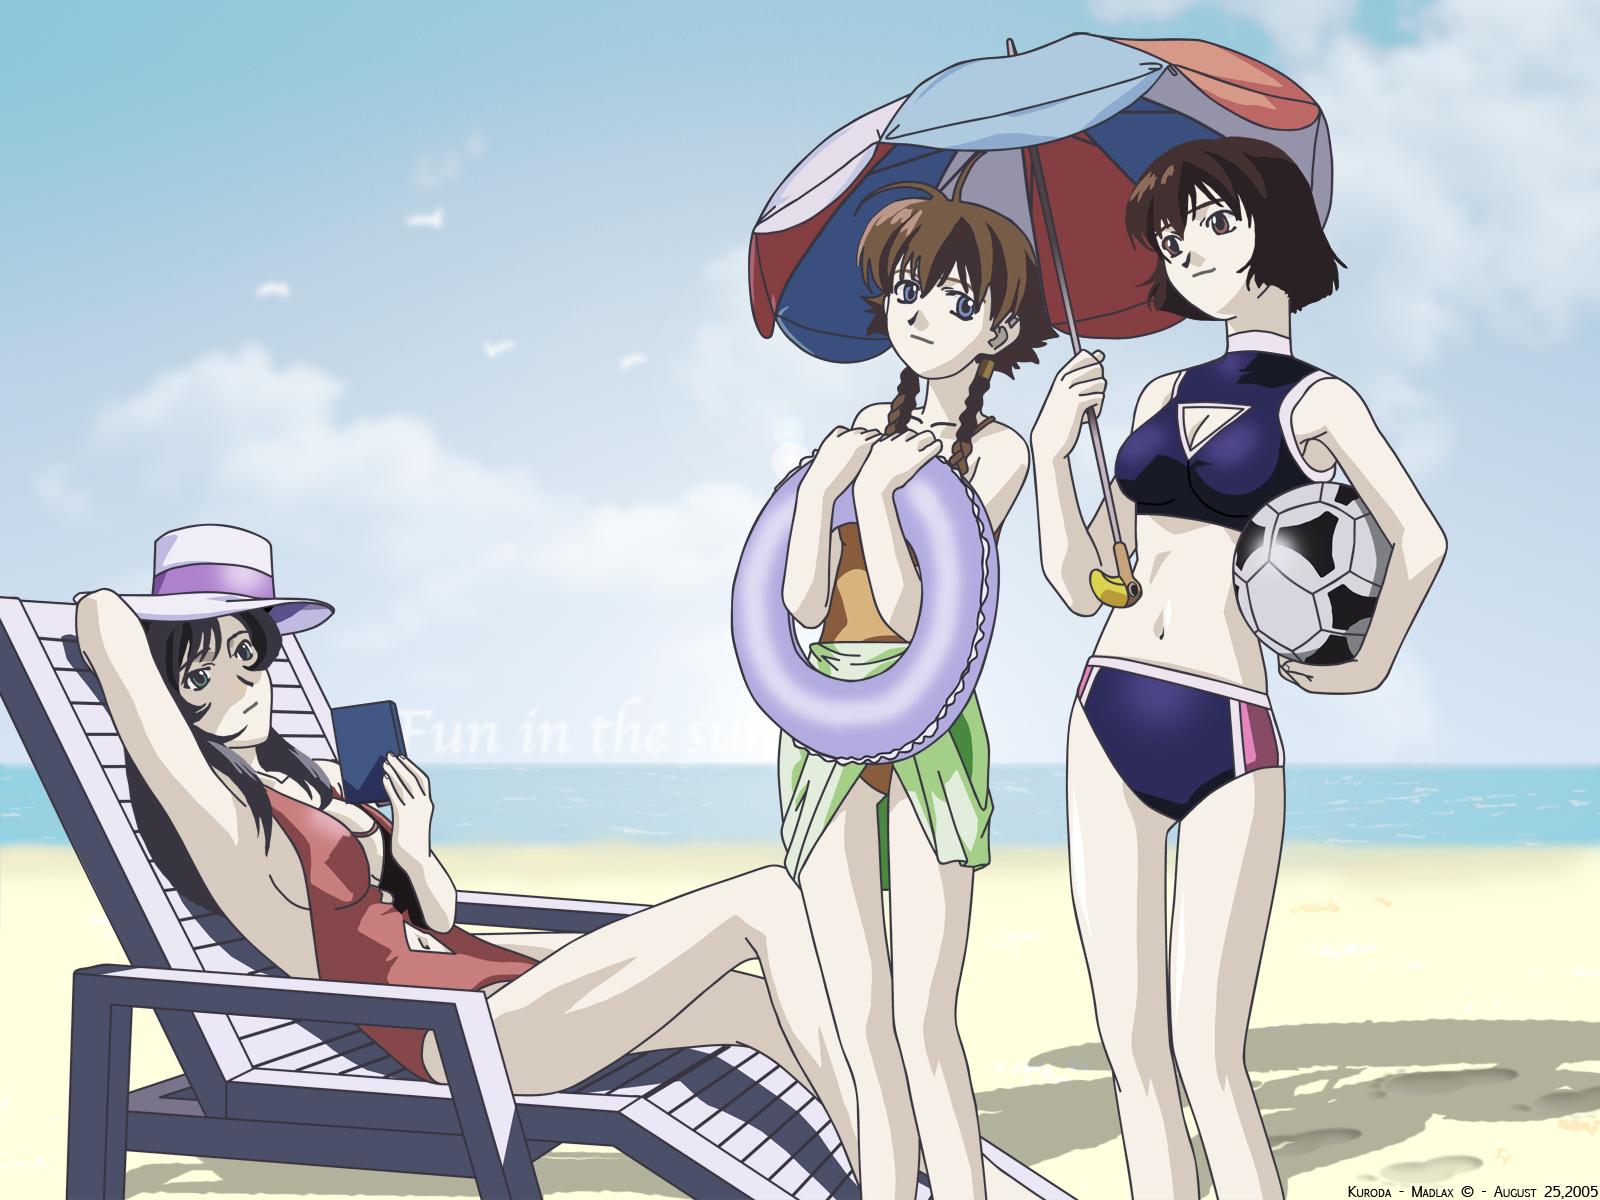 ball beach hat madlax madlax_(character) margaret_burton swim_ring swimsuit umbrella